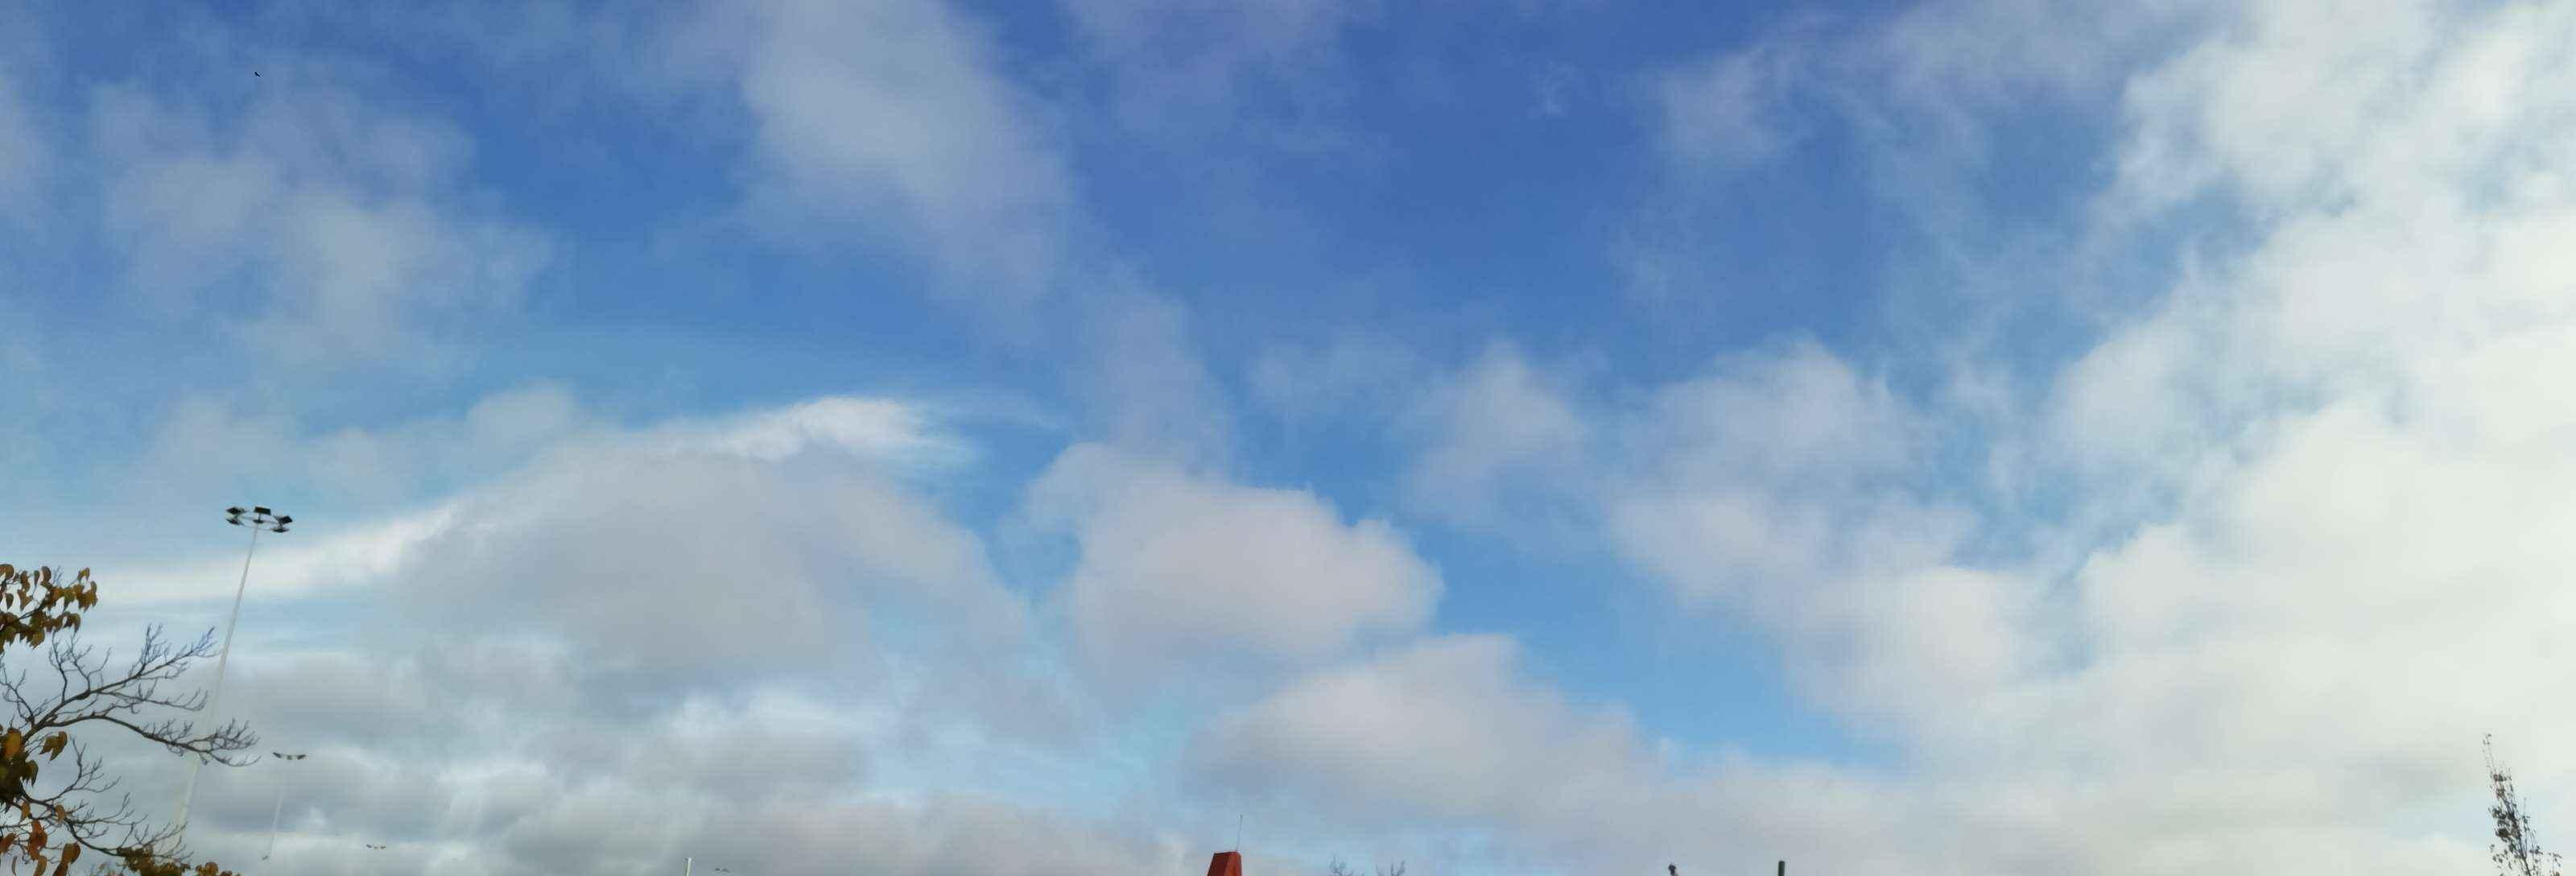 am�lioration brouillard nuages stratus